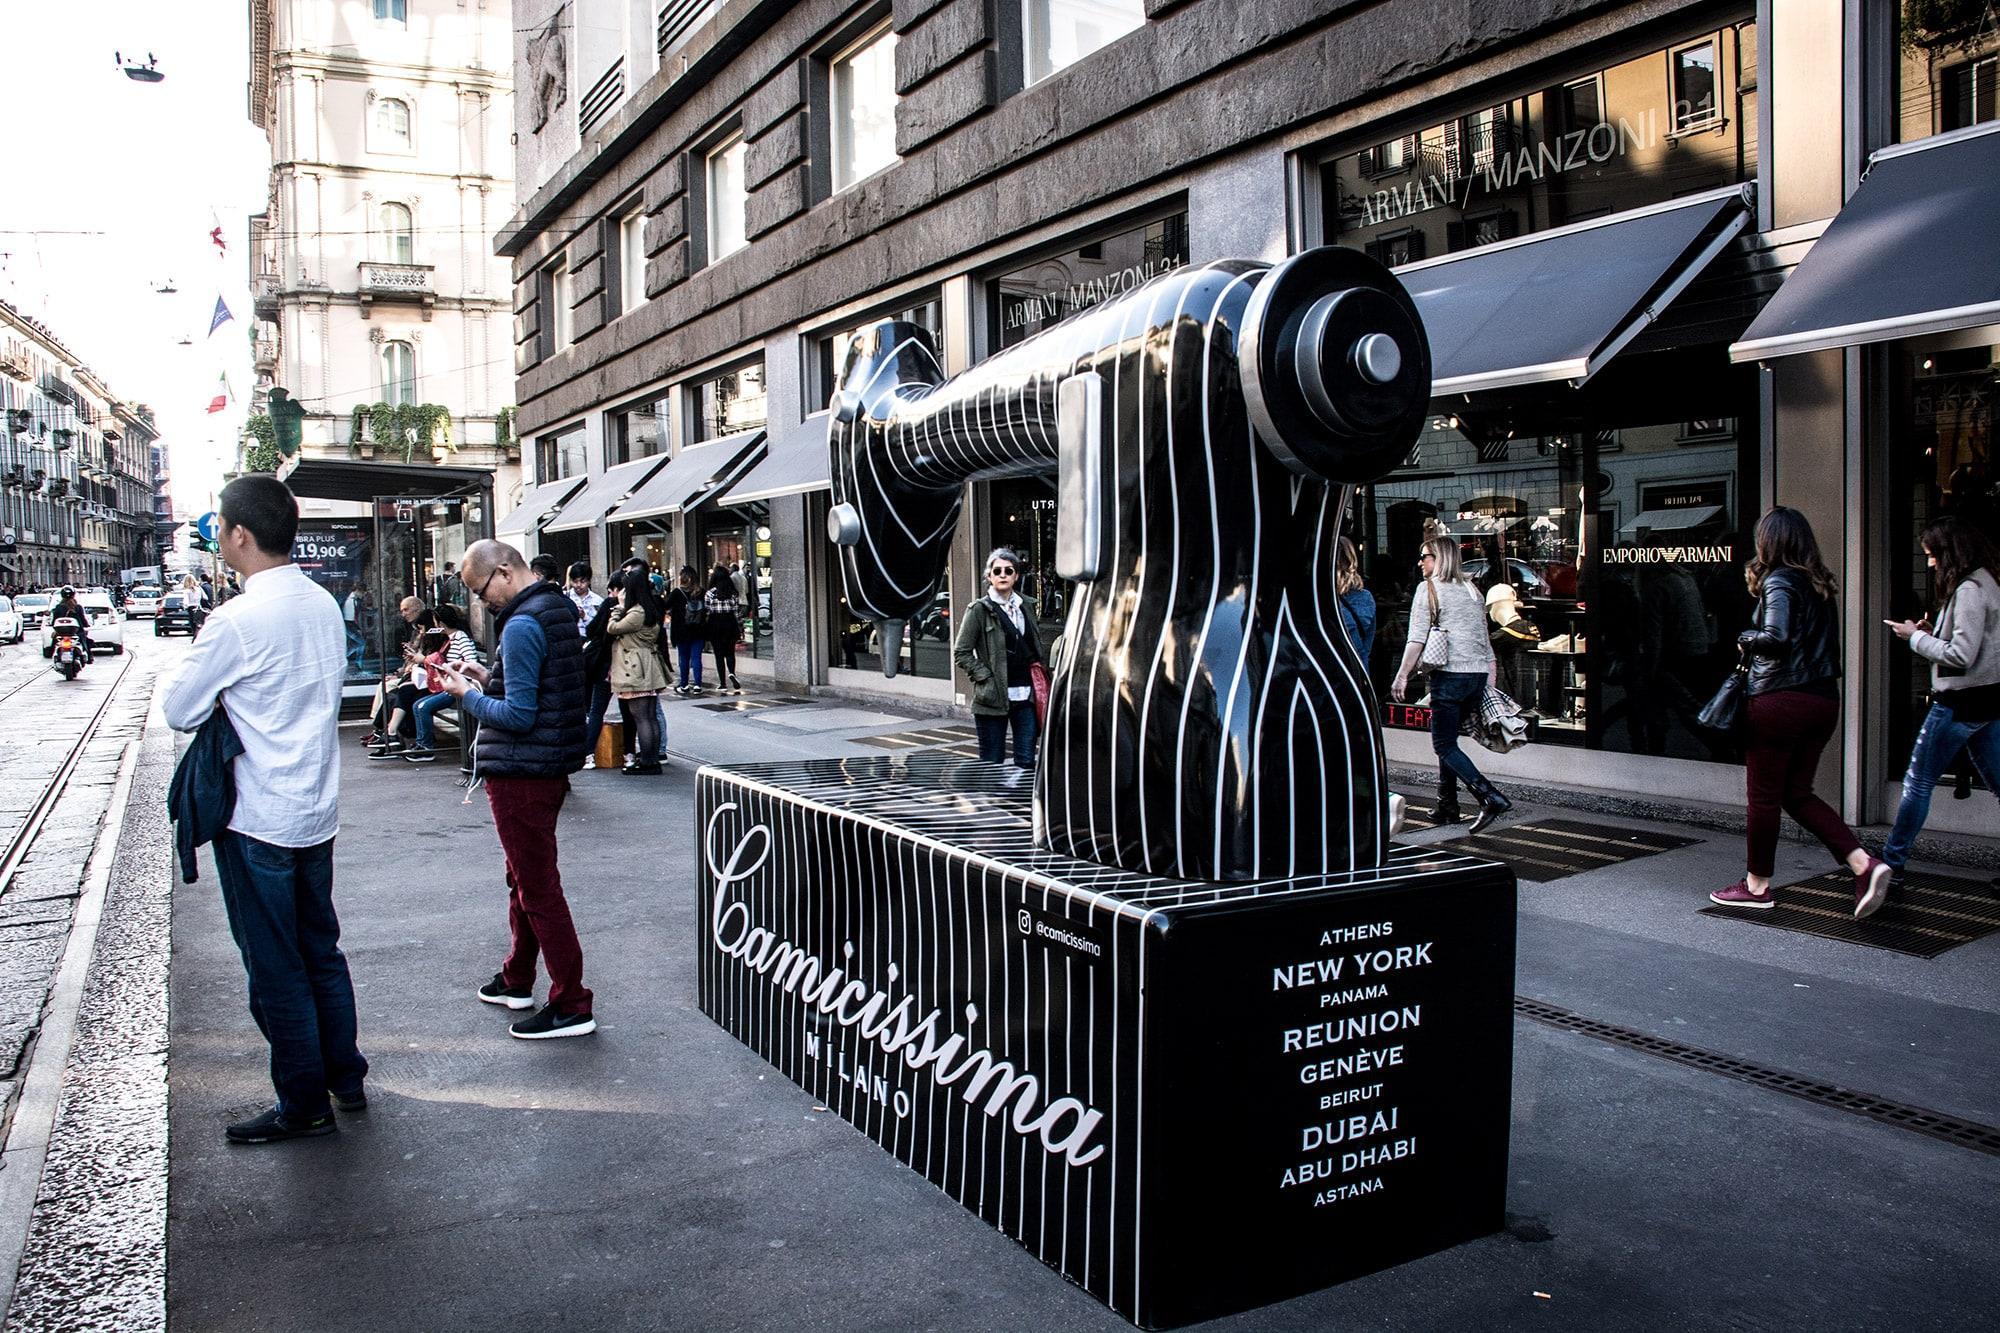 DSC 6027 min #общество Campari, wizzair, Брера, бутик, визы, Грузия, Дуомо, Италия, Кутаиси, Ла Скала, Милан, мода, шоппинг